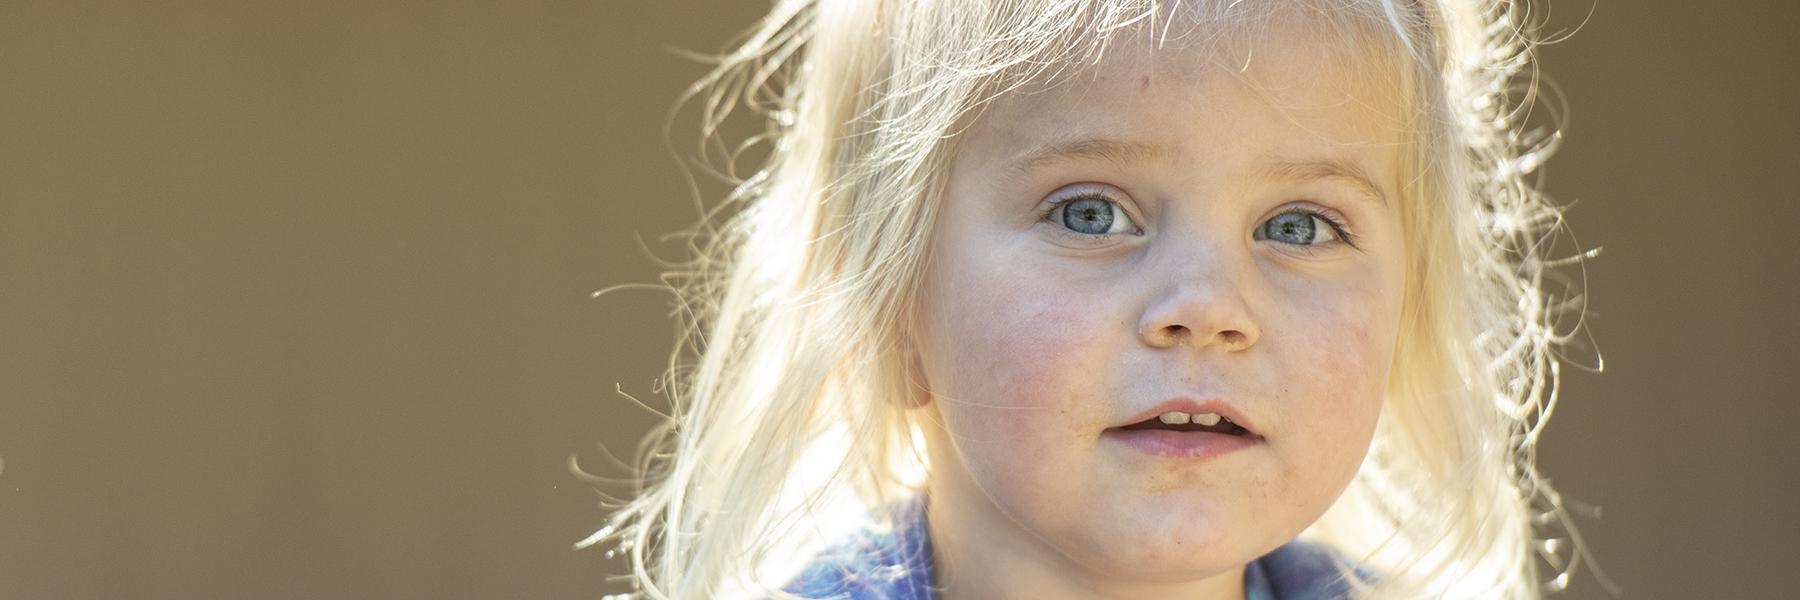 Tue lapsia Suomessa